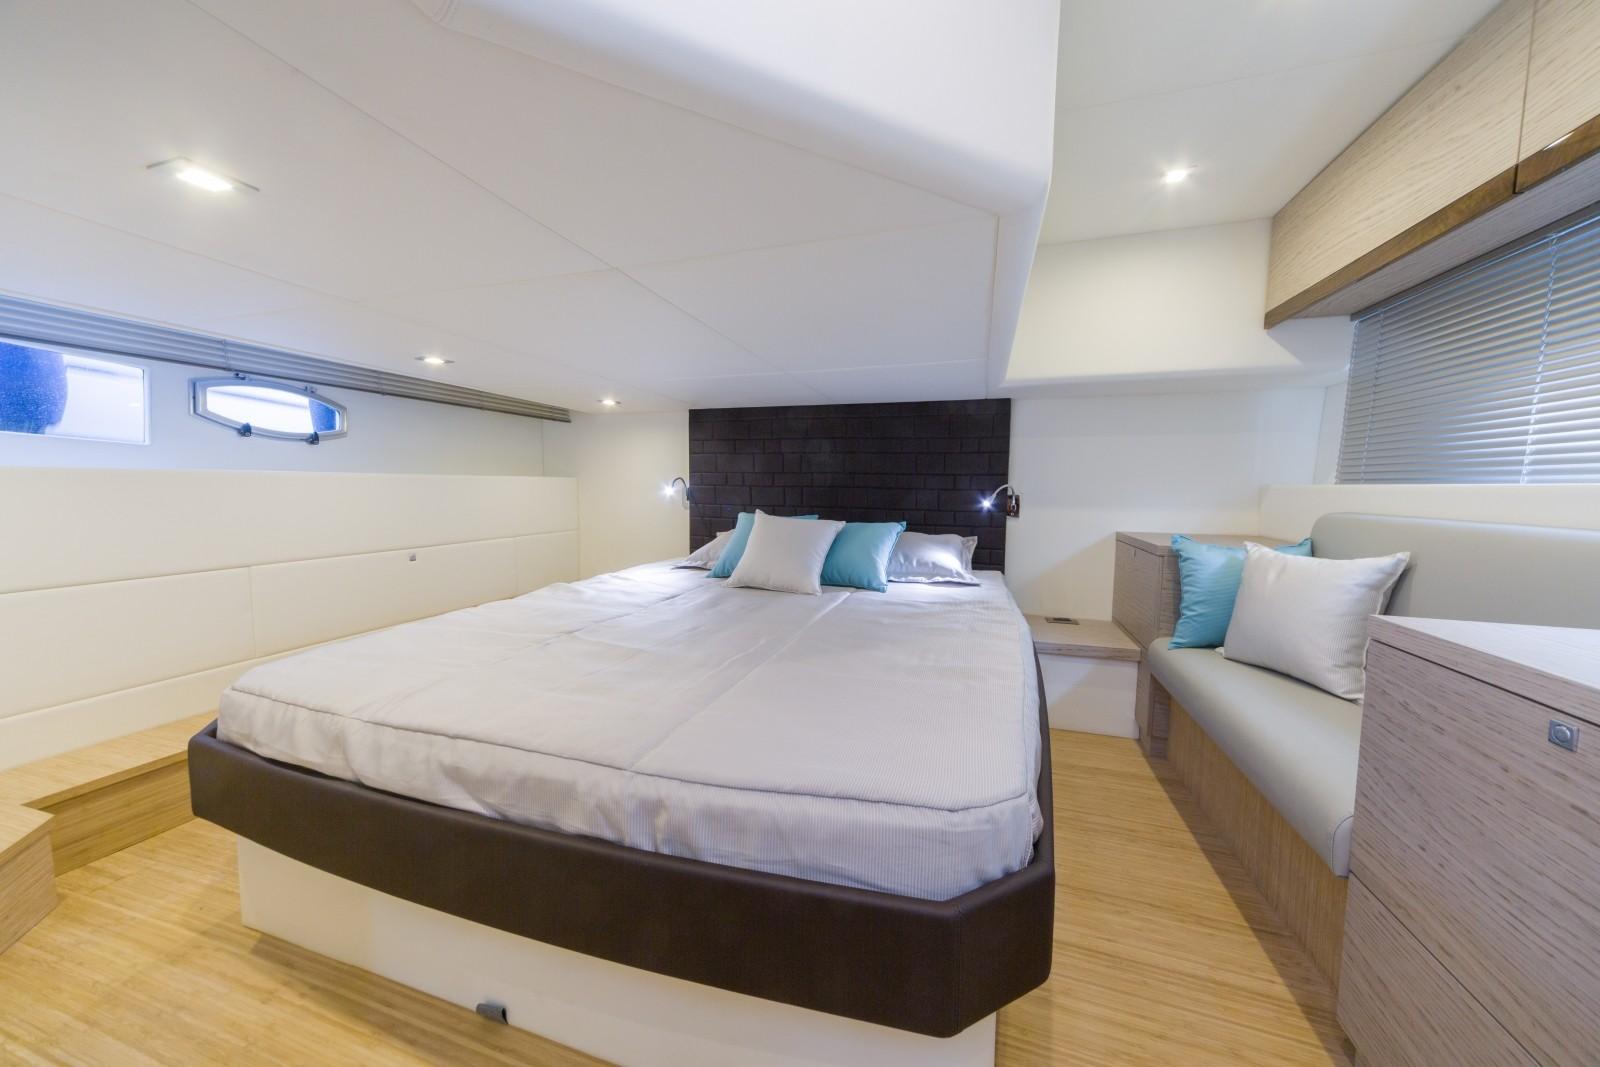 Aluminium Venetian Blinds Installed in Yacht Master Cabin